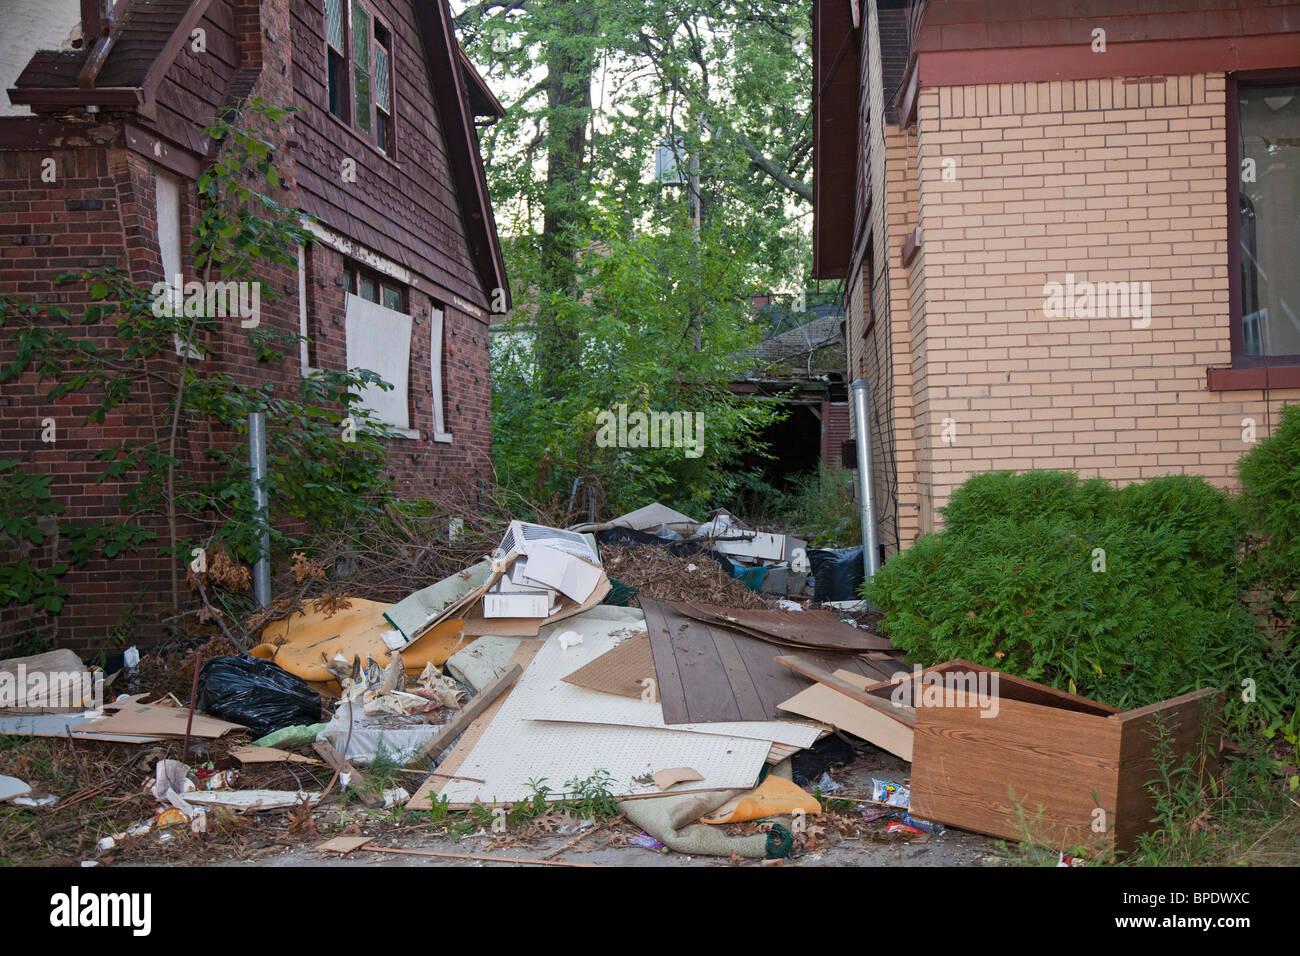 Illegally Dumped Trash in Detroit Neighborhood - Stock Image